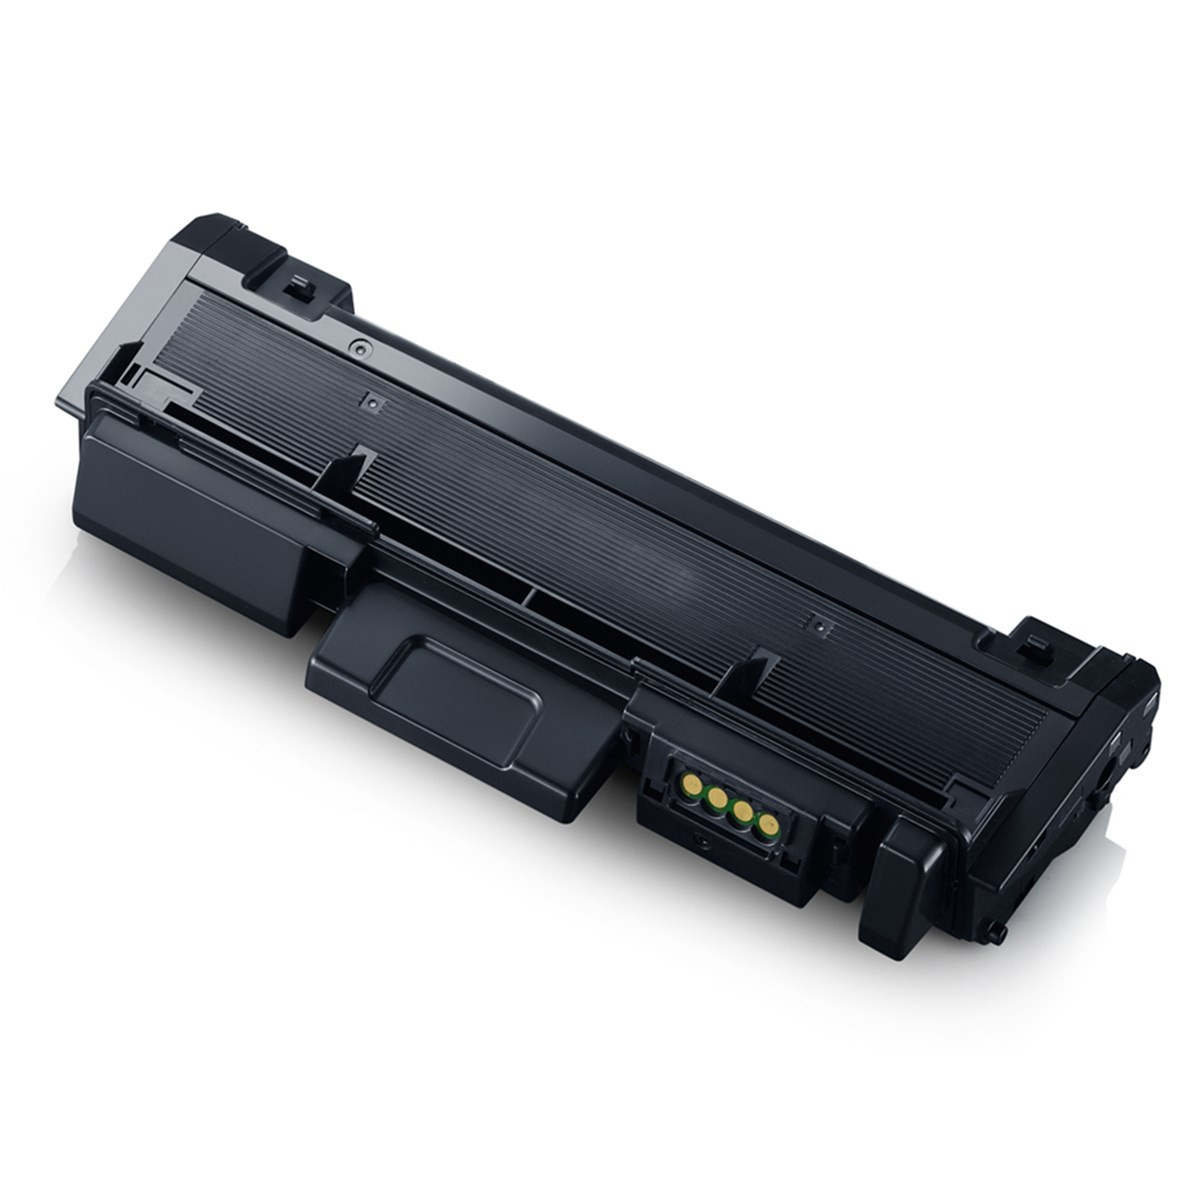 Toner Compatível com Samsung MLT-D116L D116 116L | SL-M2885FW M2835DW M2825ND M2875FD | Premium 3k